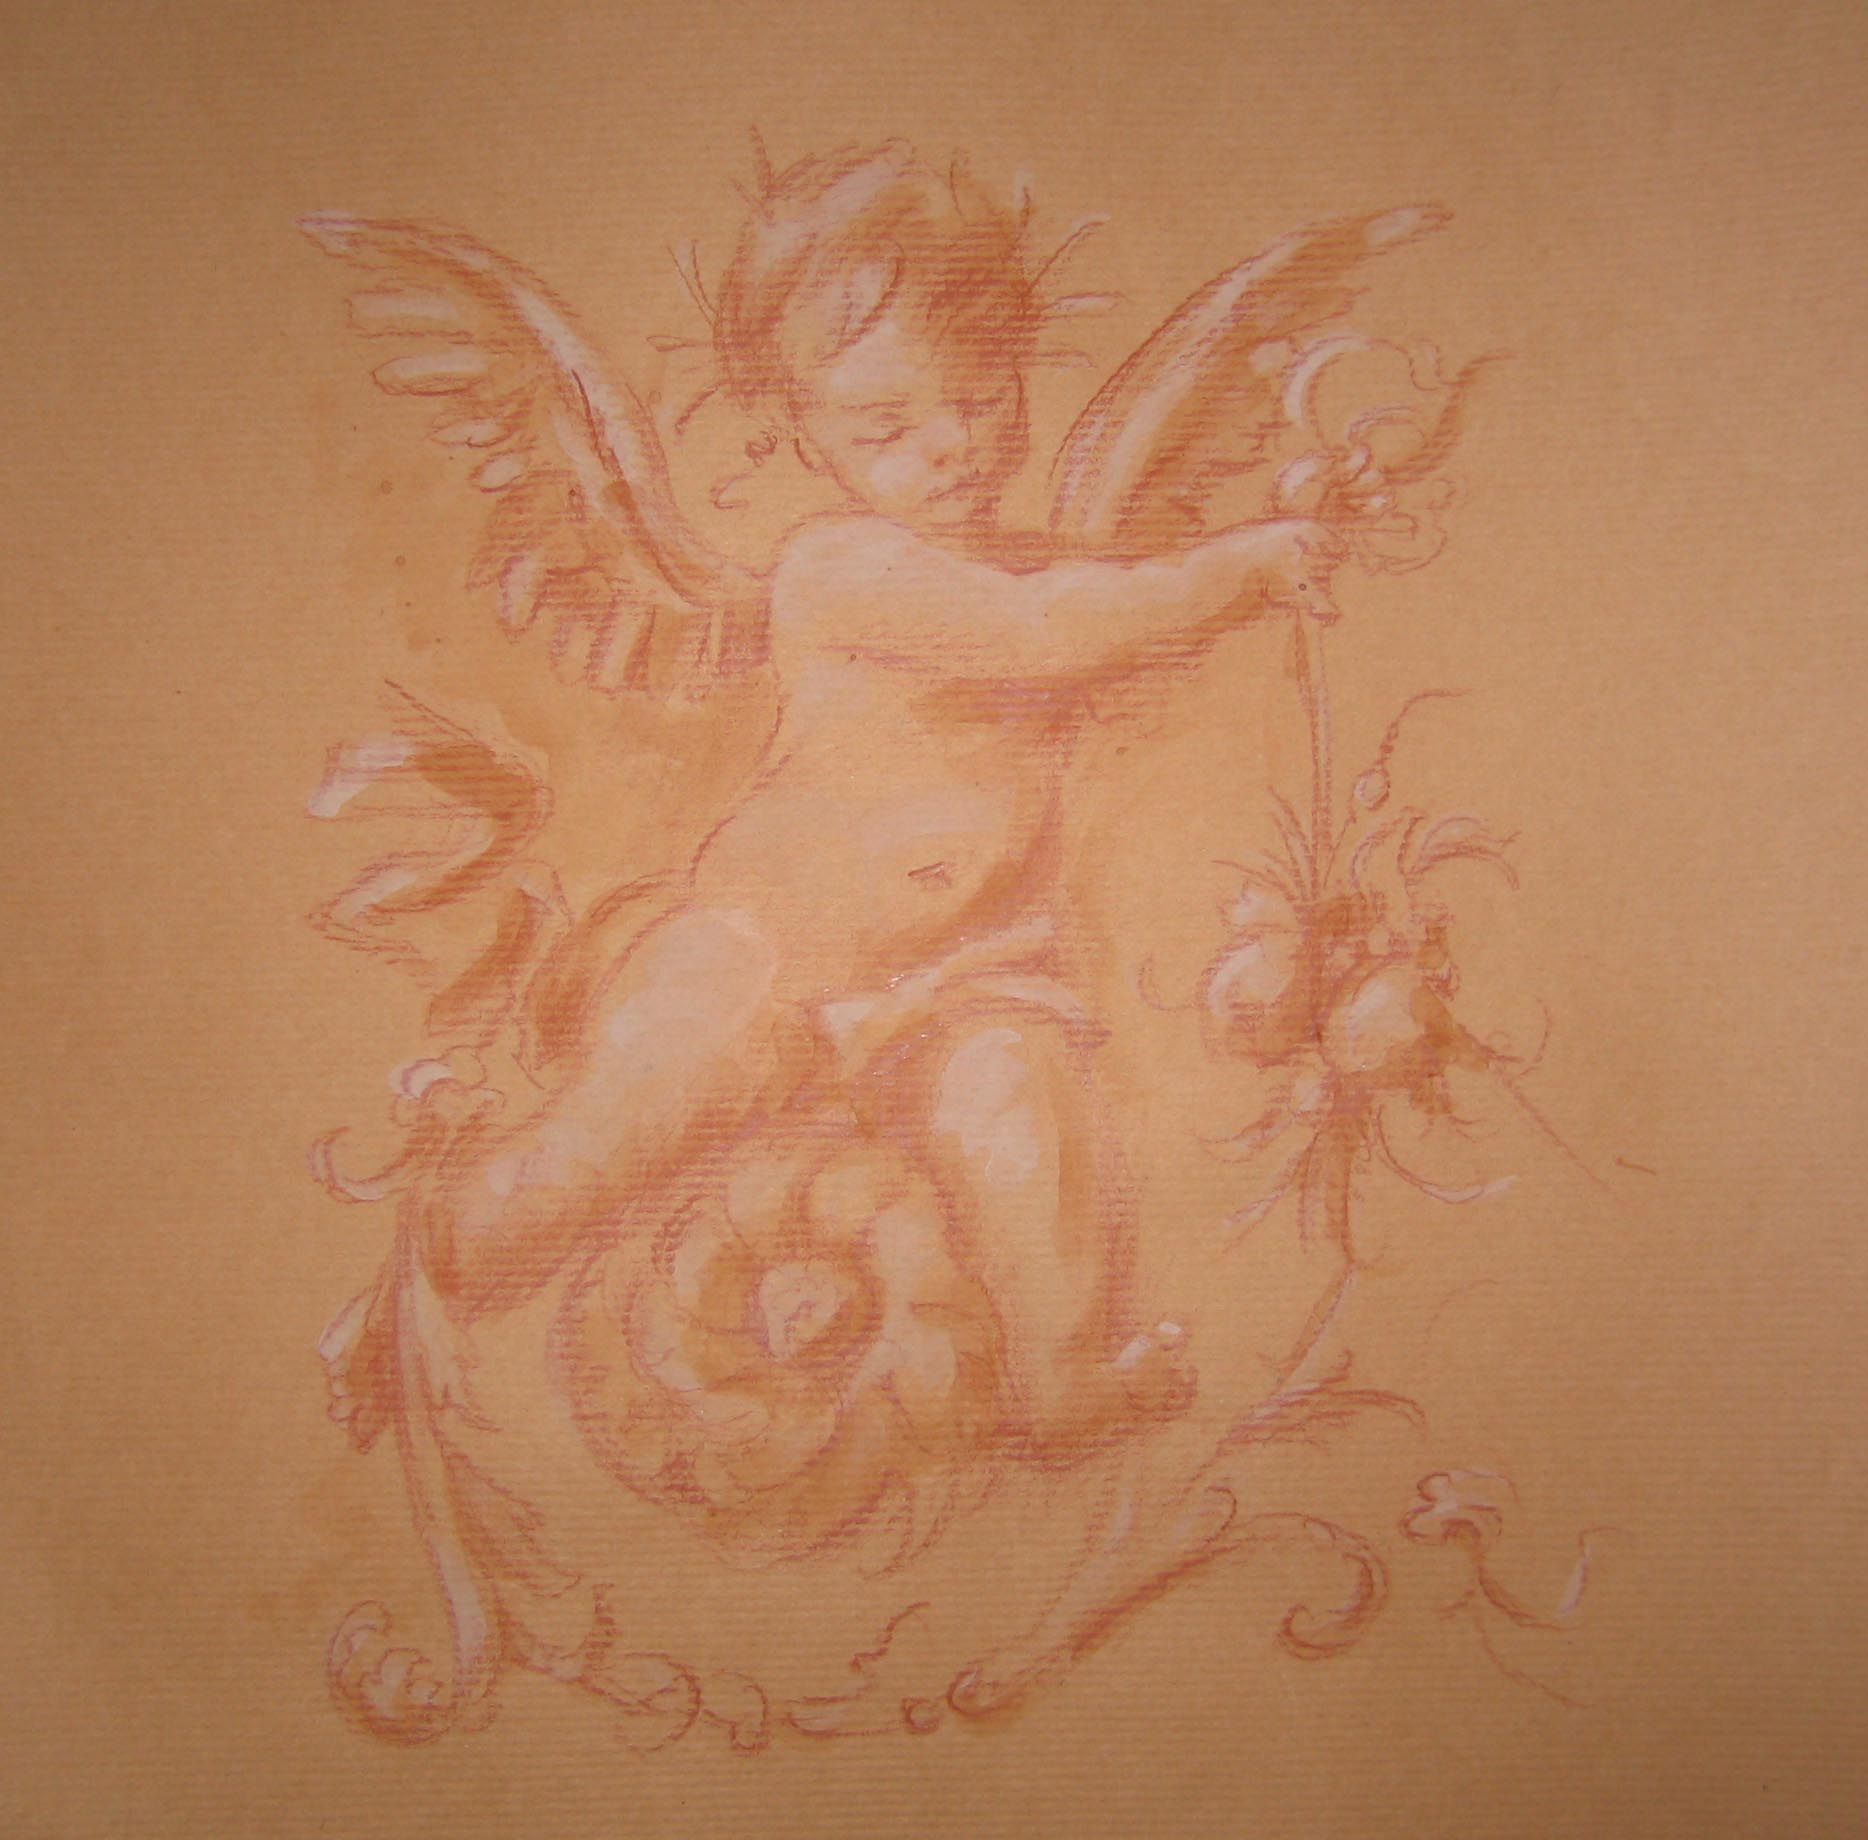 engel.jpg